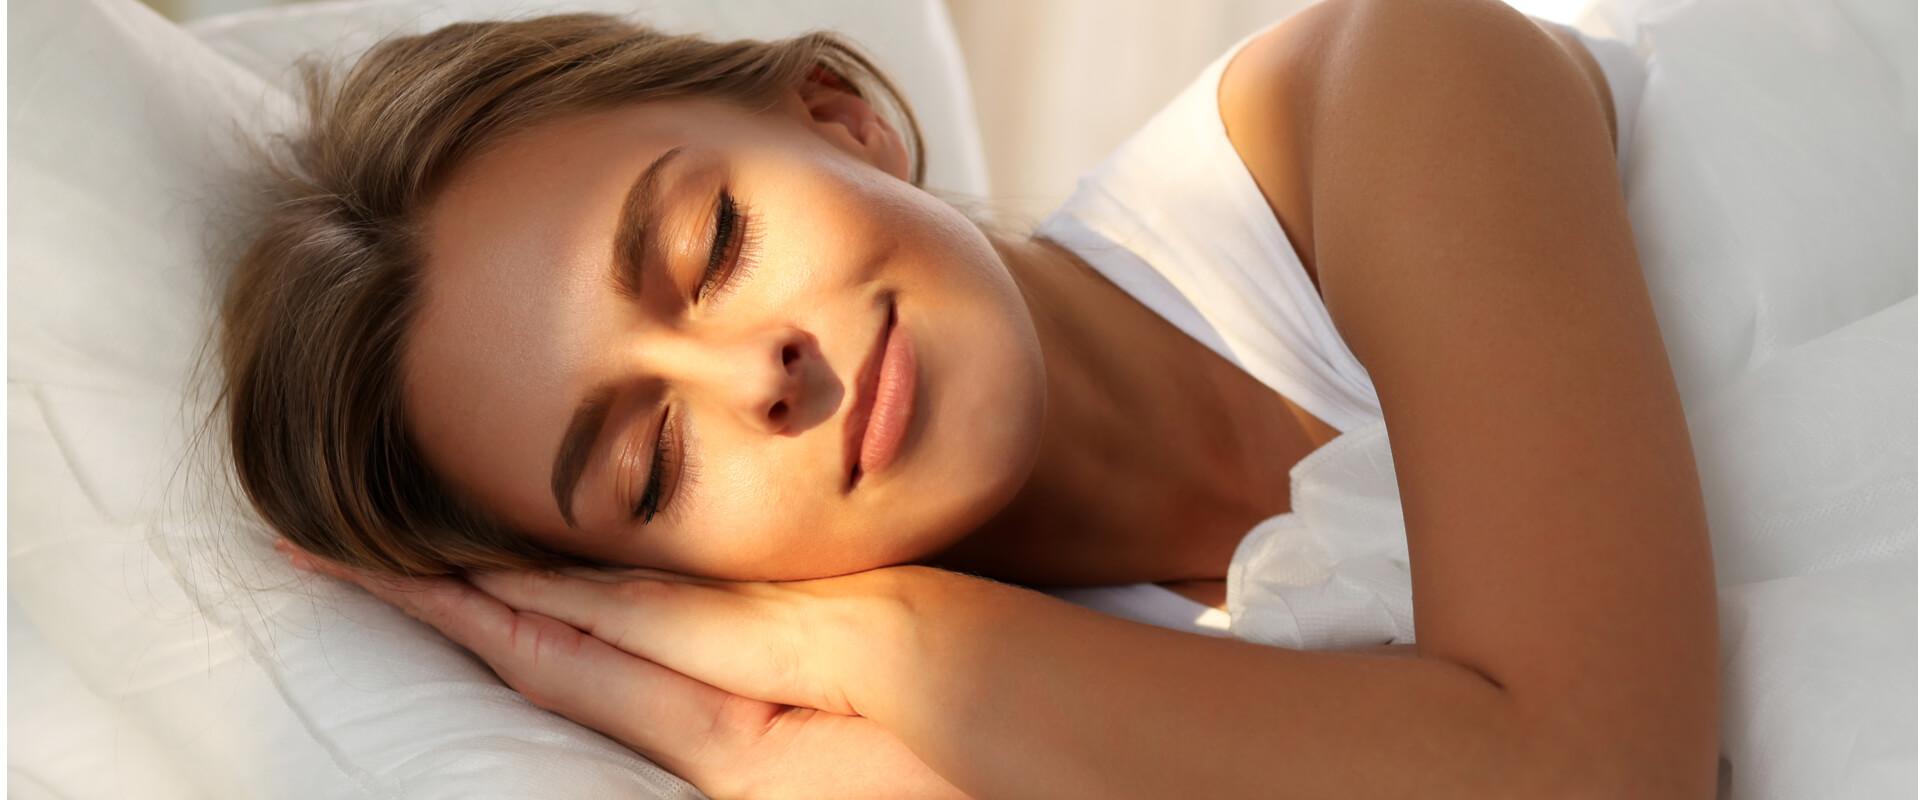 Mujer descansando feliz